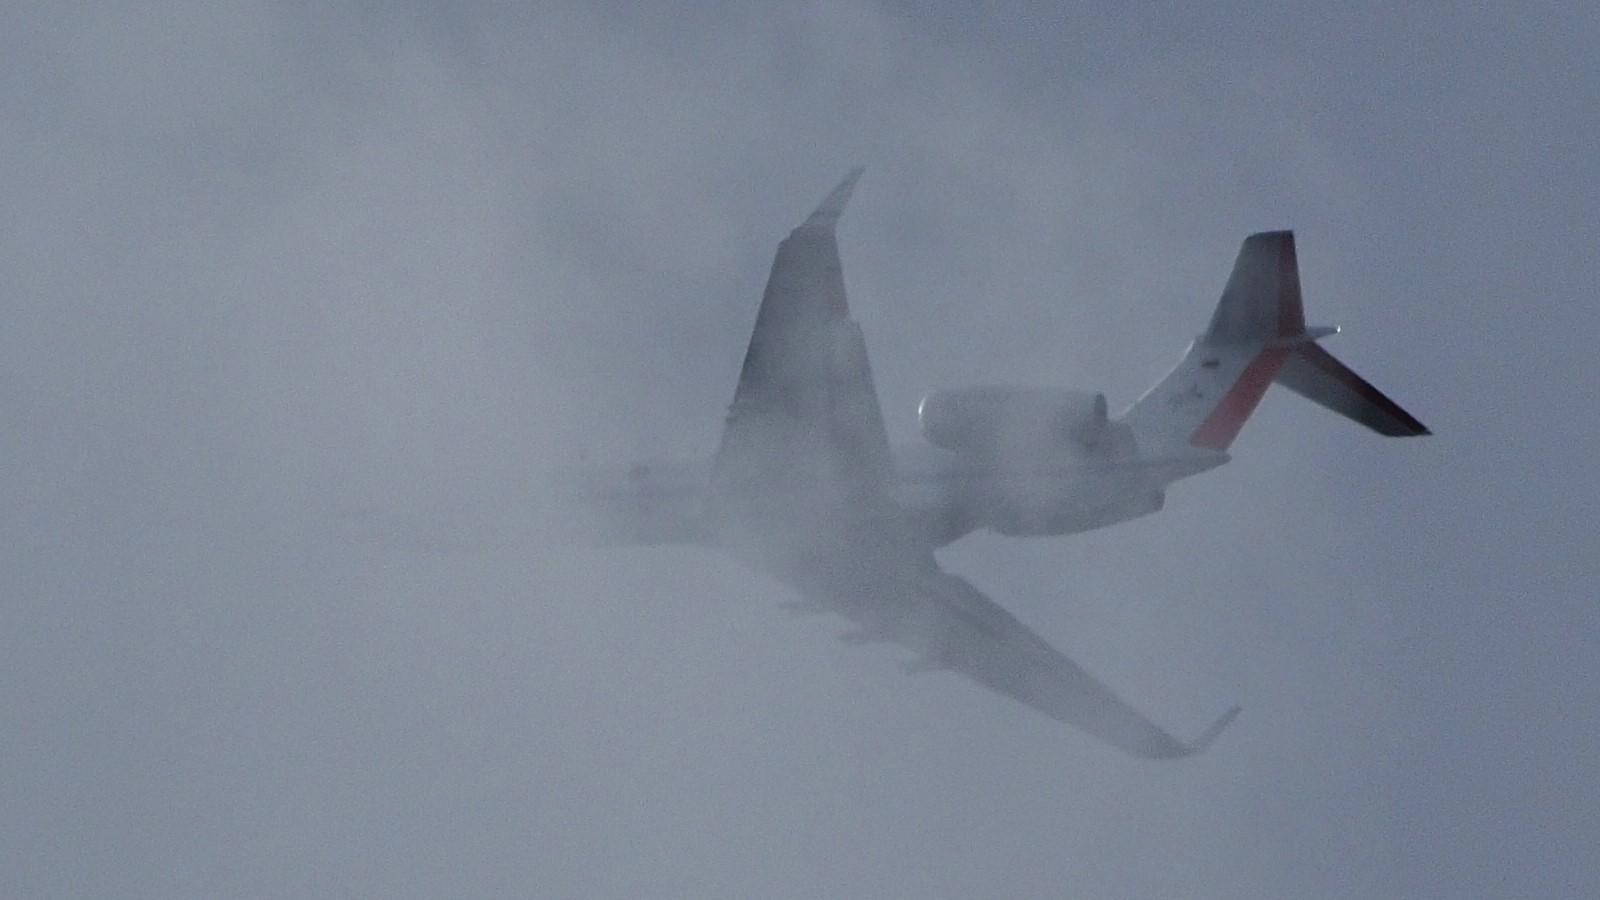 HALO flies in clouds over MIM